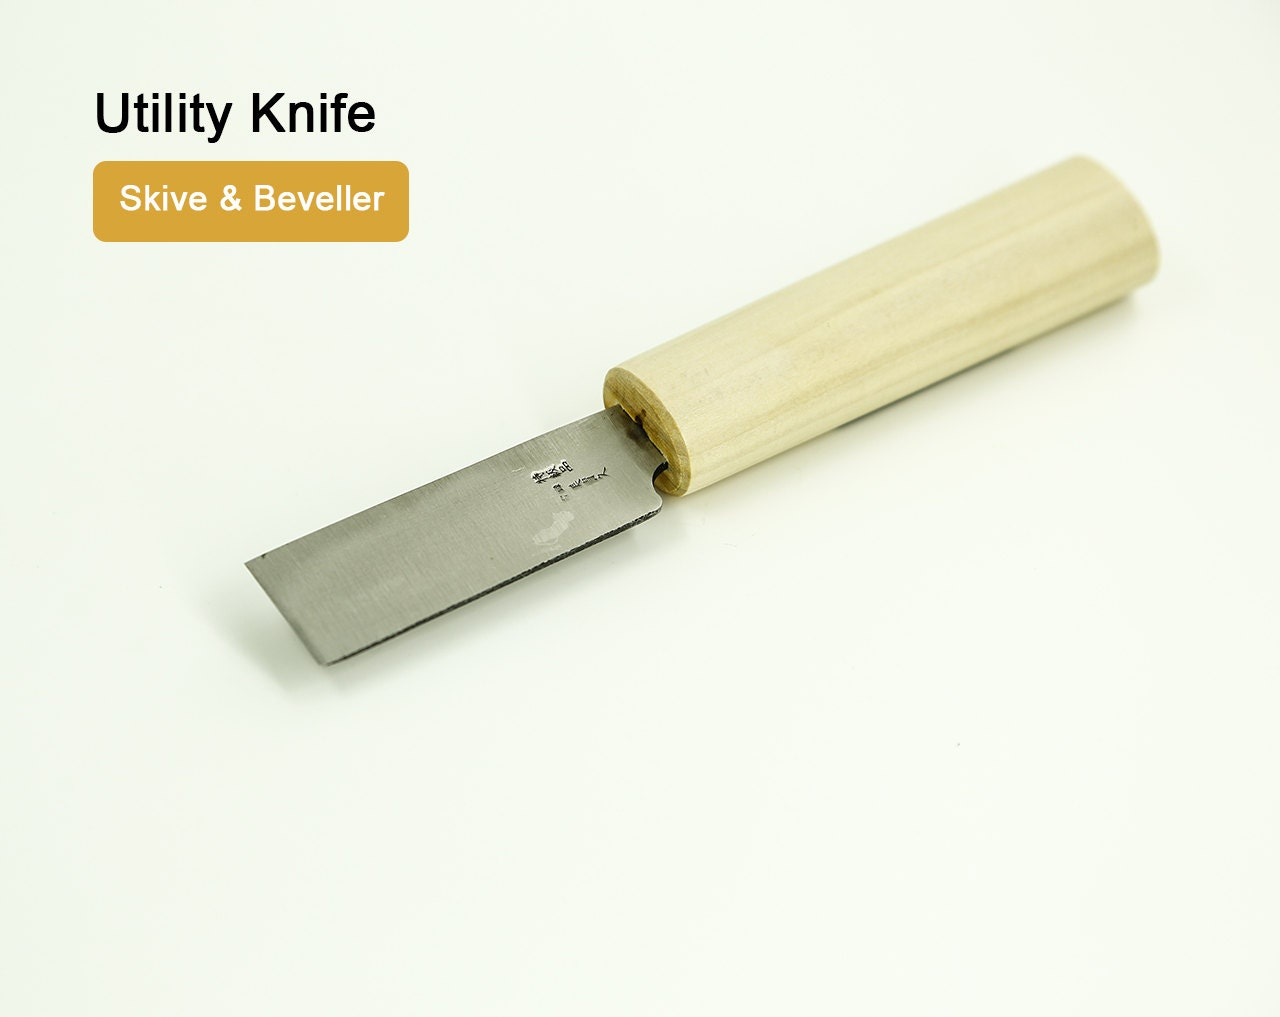 Utility Knife 24mm Skive Amp Beveller Leather Leathermob Kyoshin